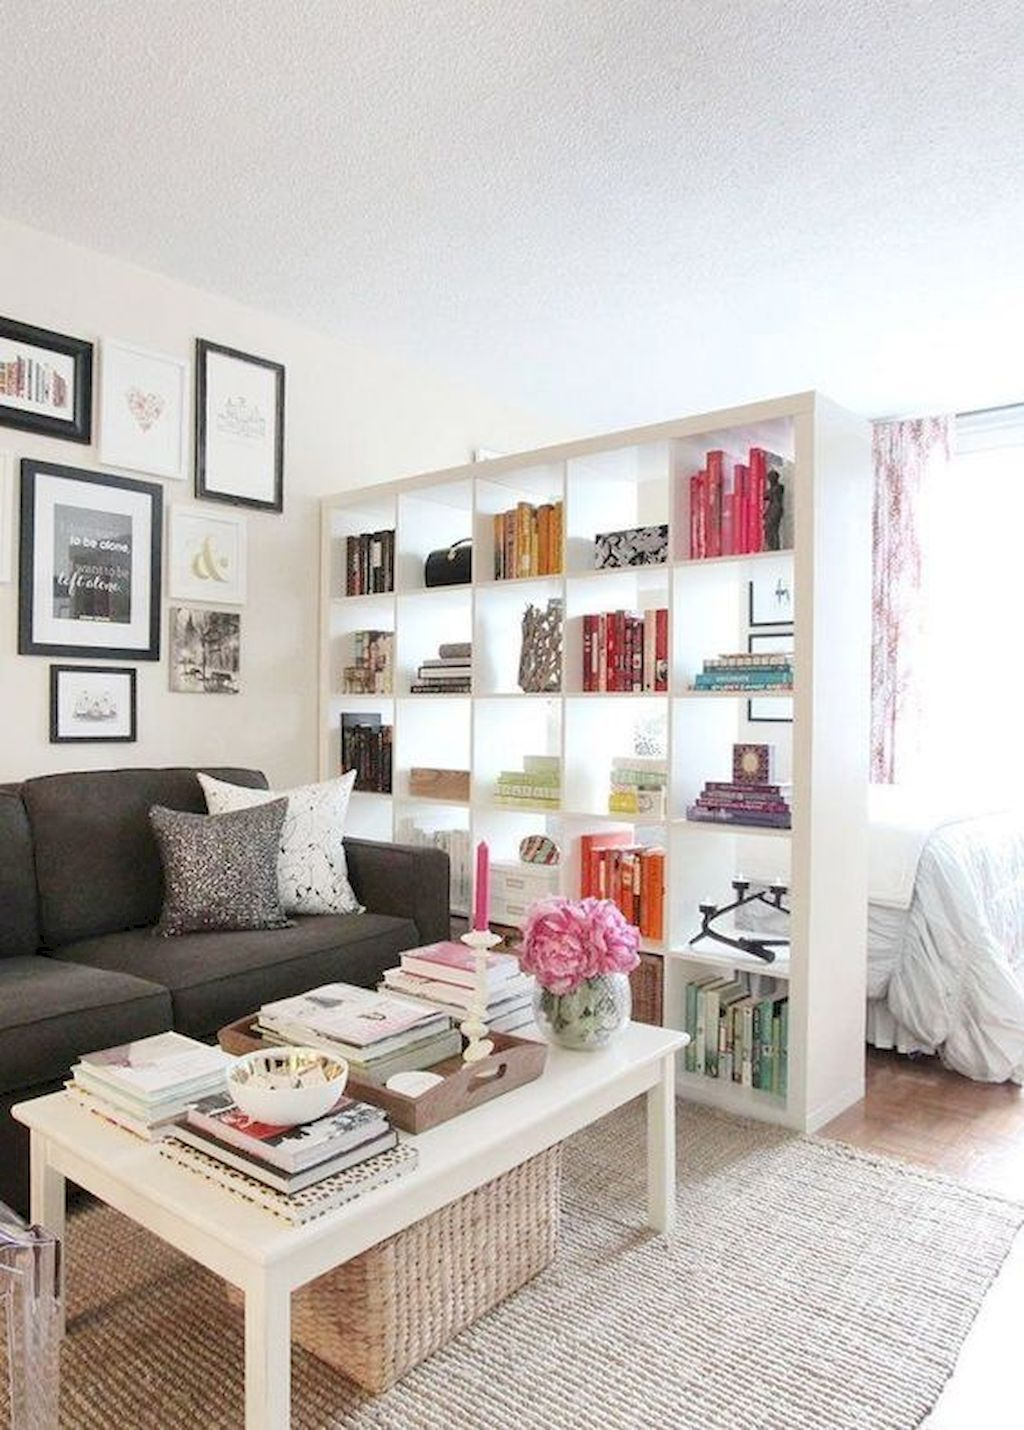 Studio-Apartment-Decorating-Ideas-on-A-Budget-2 – Home Decor ...